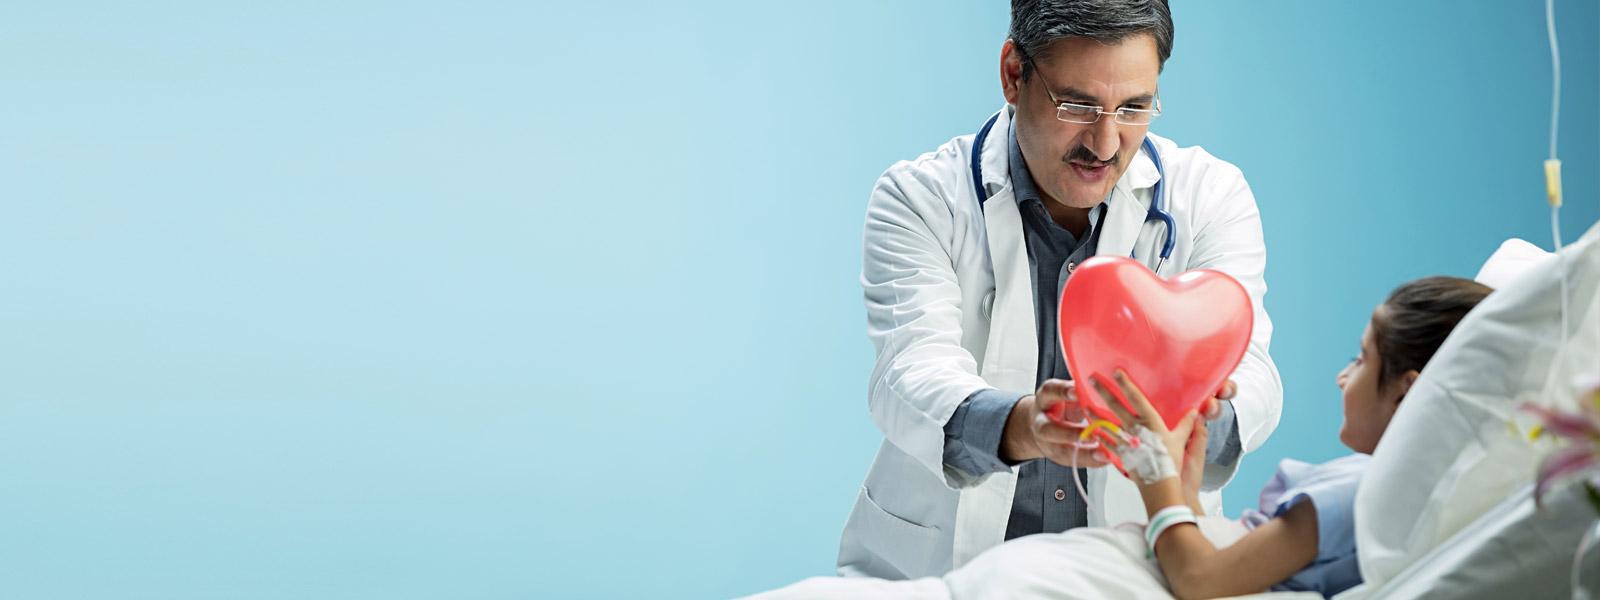 Pediatrics Cardiology & Cardiac Surgery